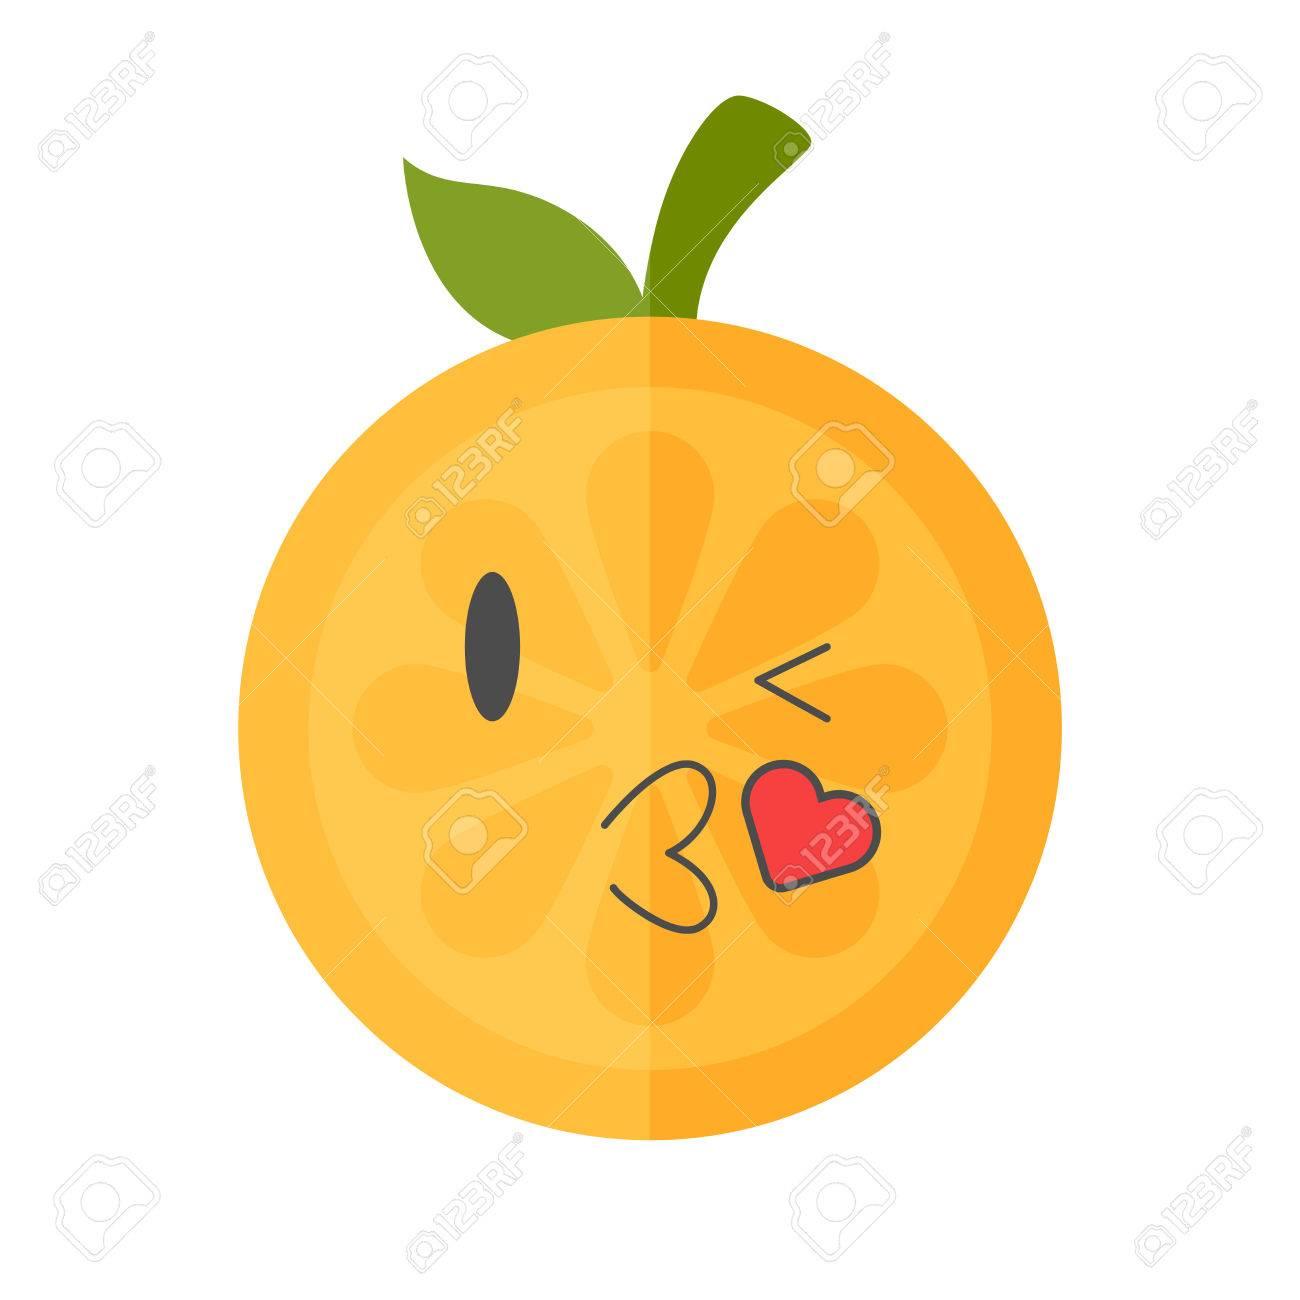 kiss emoji kissing orange fruit emoji with heart vector flat